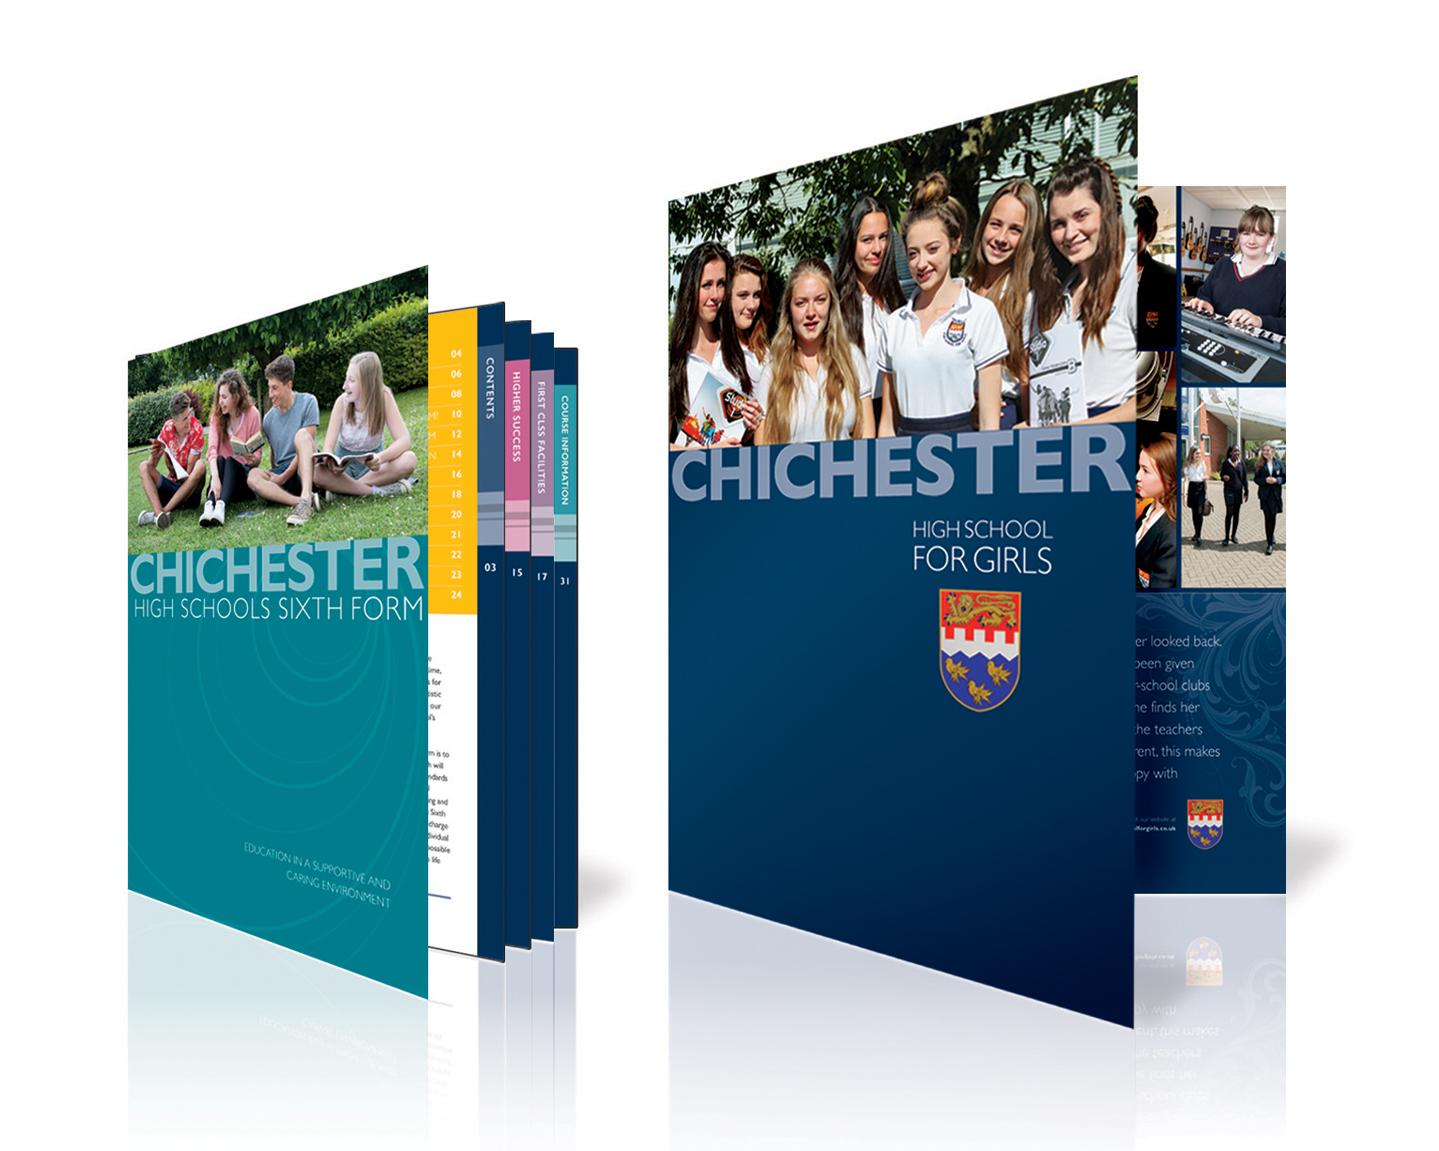 CHICHESTER PROSPECTUS covers